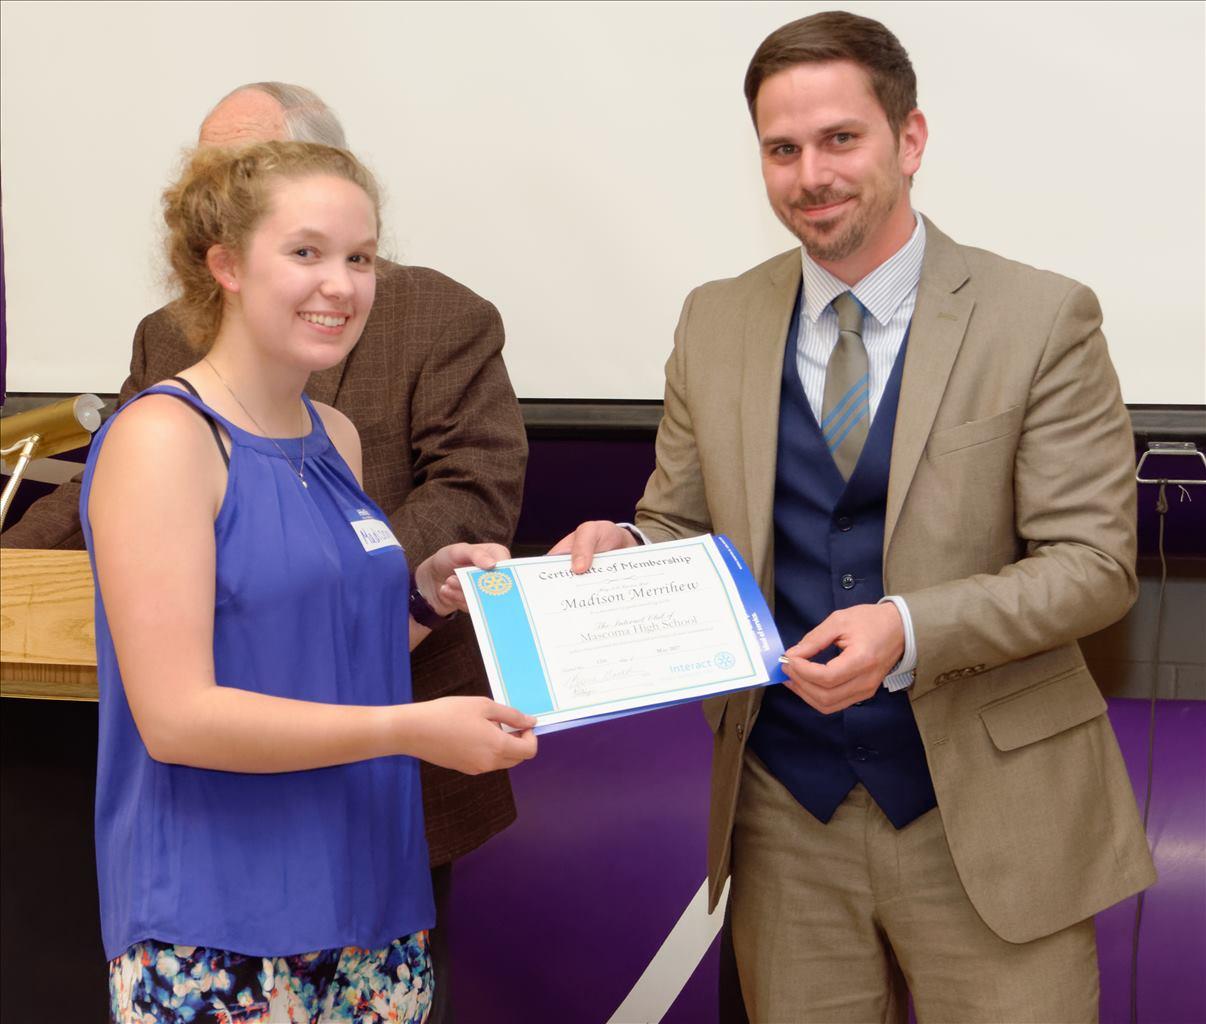 Evan Leary presents Madison Merrihew her Interact Treasurer pin and Certificate of Membership